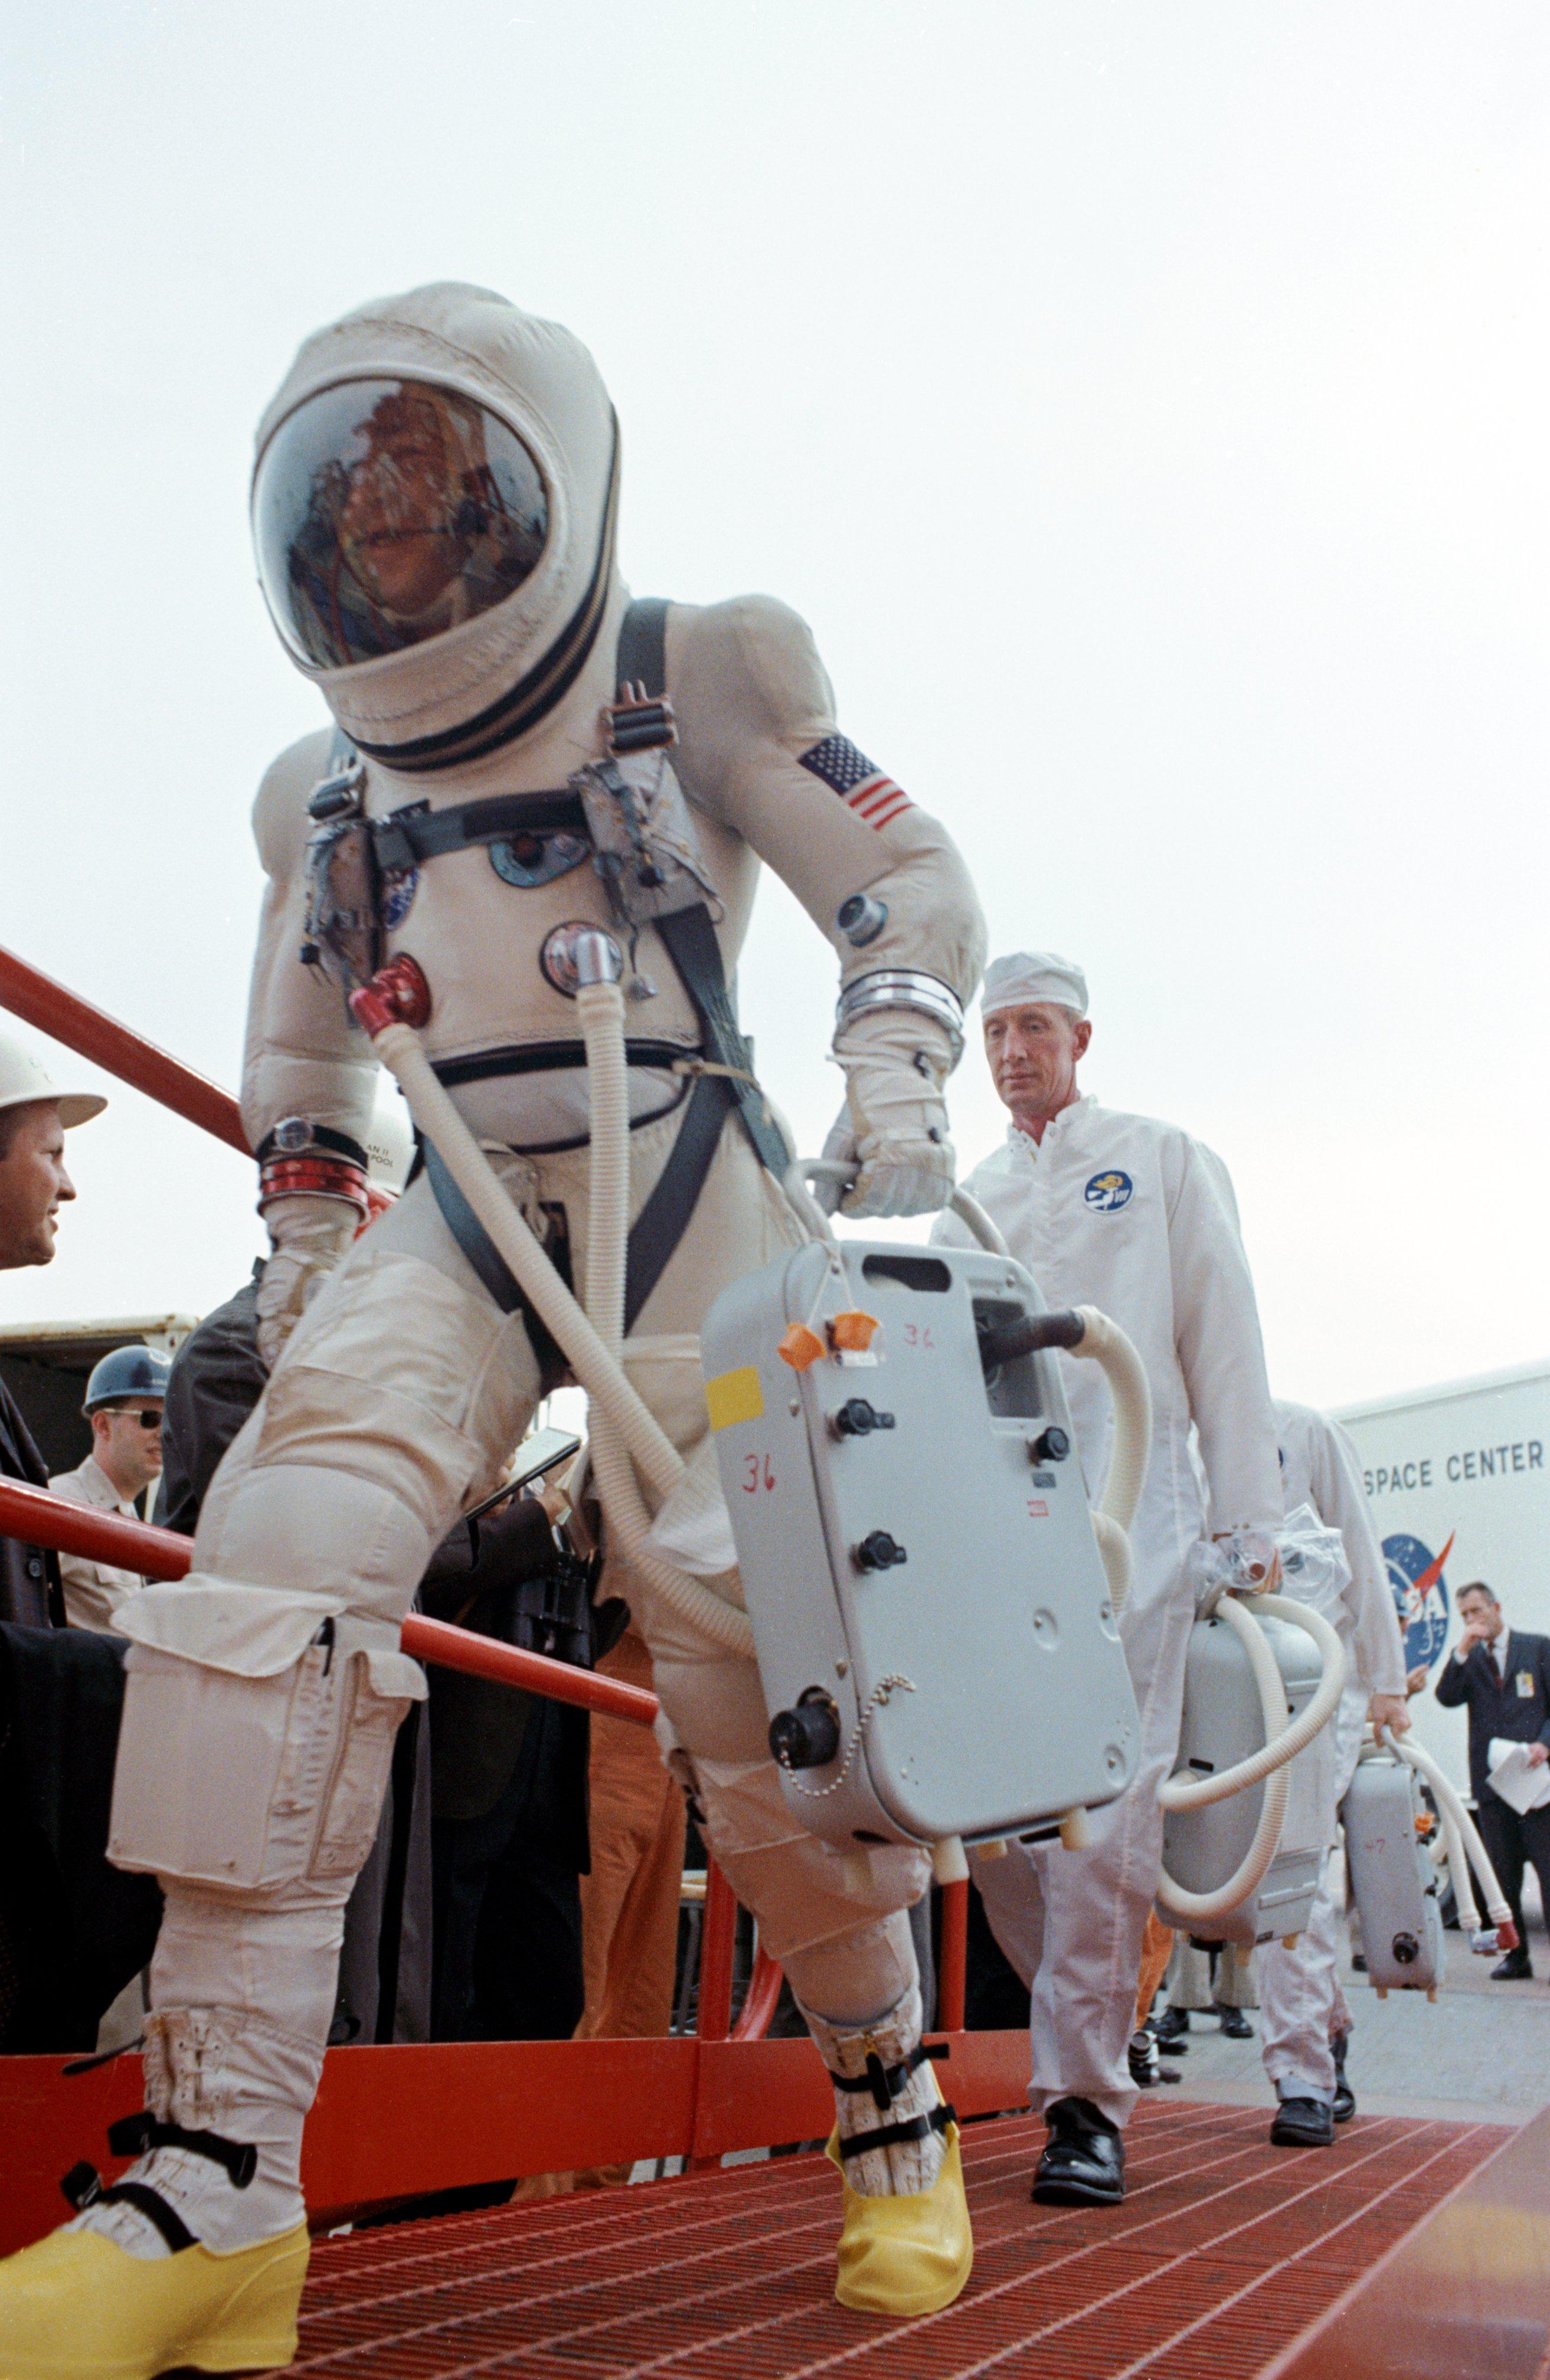 apollo 7 space suits - photo #40